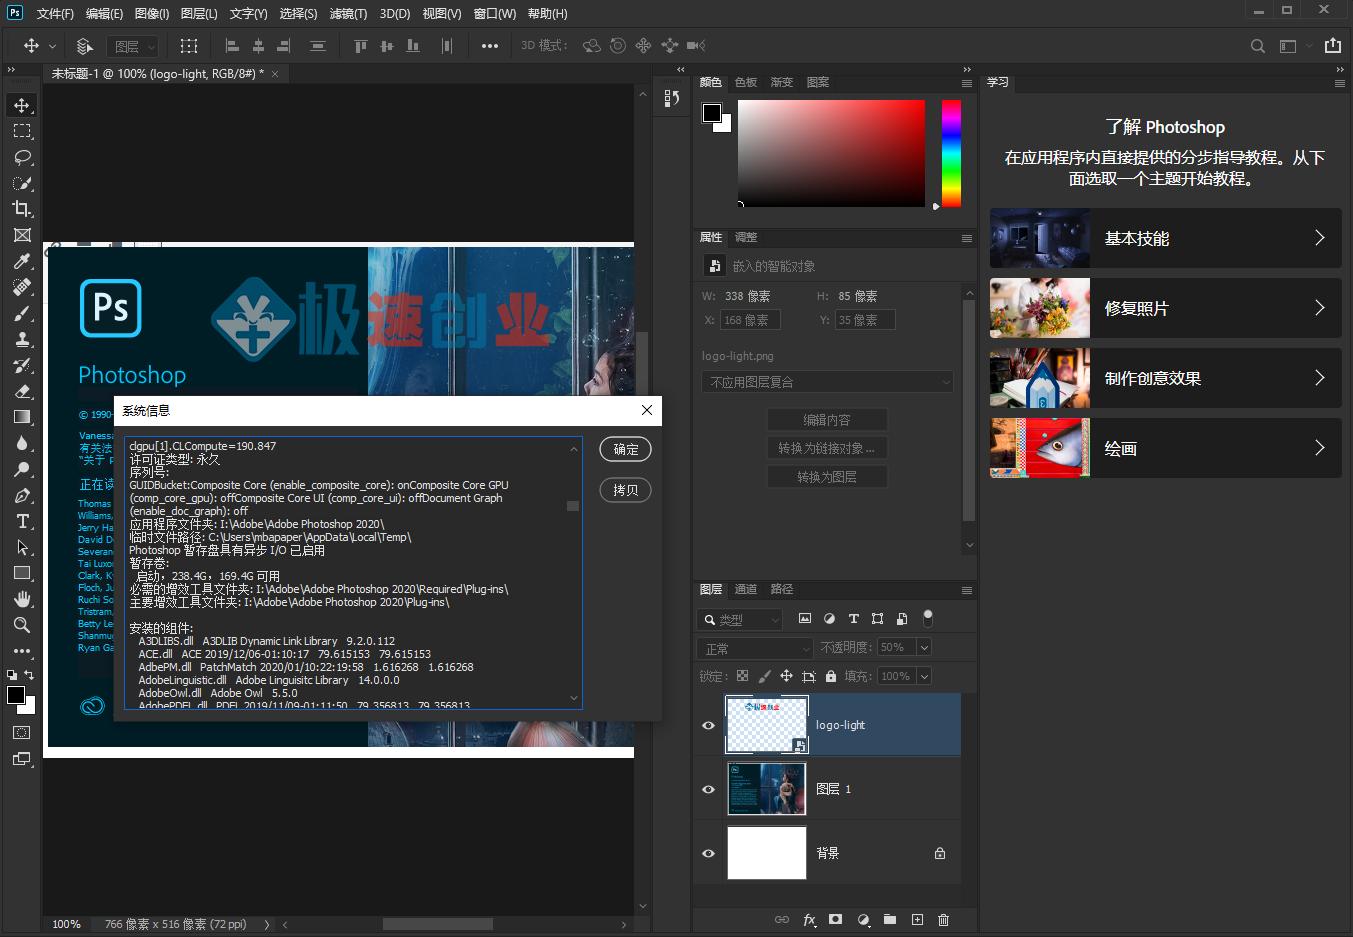 ps2020带滤镜#Adobe Photoshop CC 2020 (21.1.0.106) 茶末余香增强版